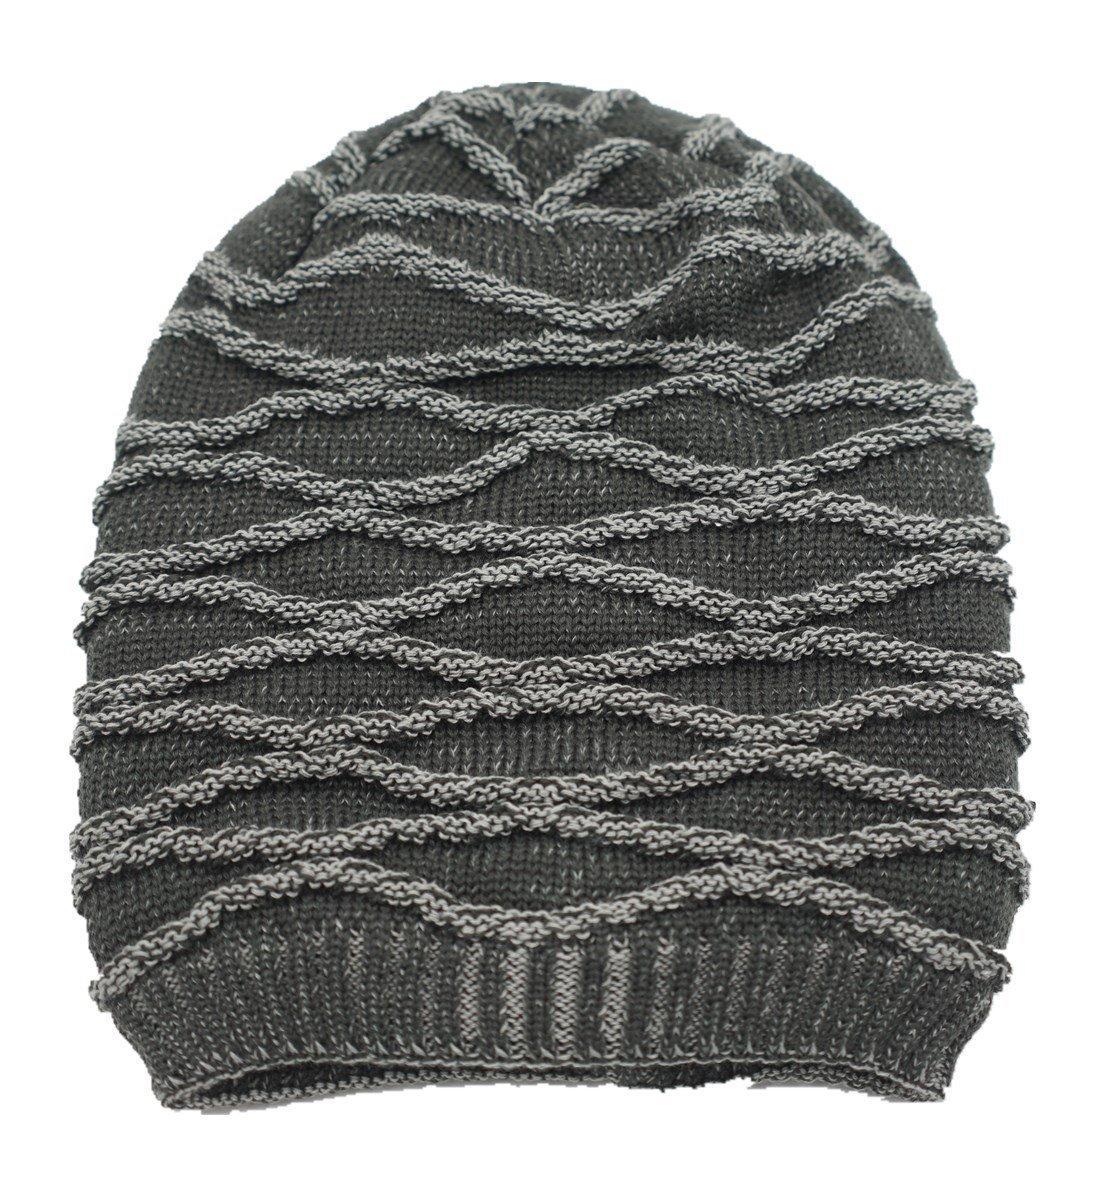 de1eb0743d0 LLmoway Men Women Slouchy Cable Knit Beanie Oversized Winter Chunky Warm  Stylish Baggy Hat Gray